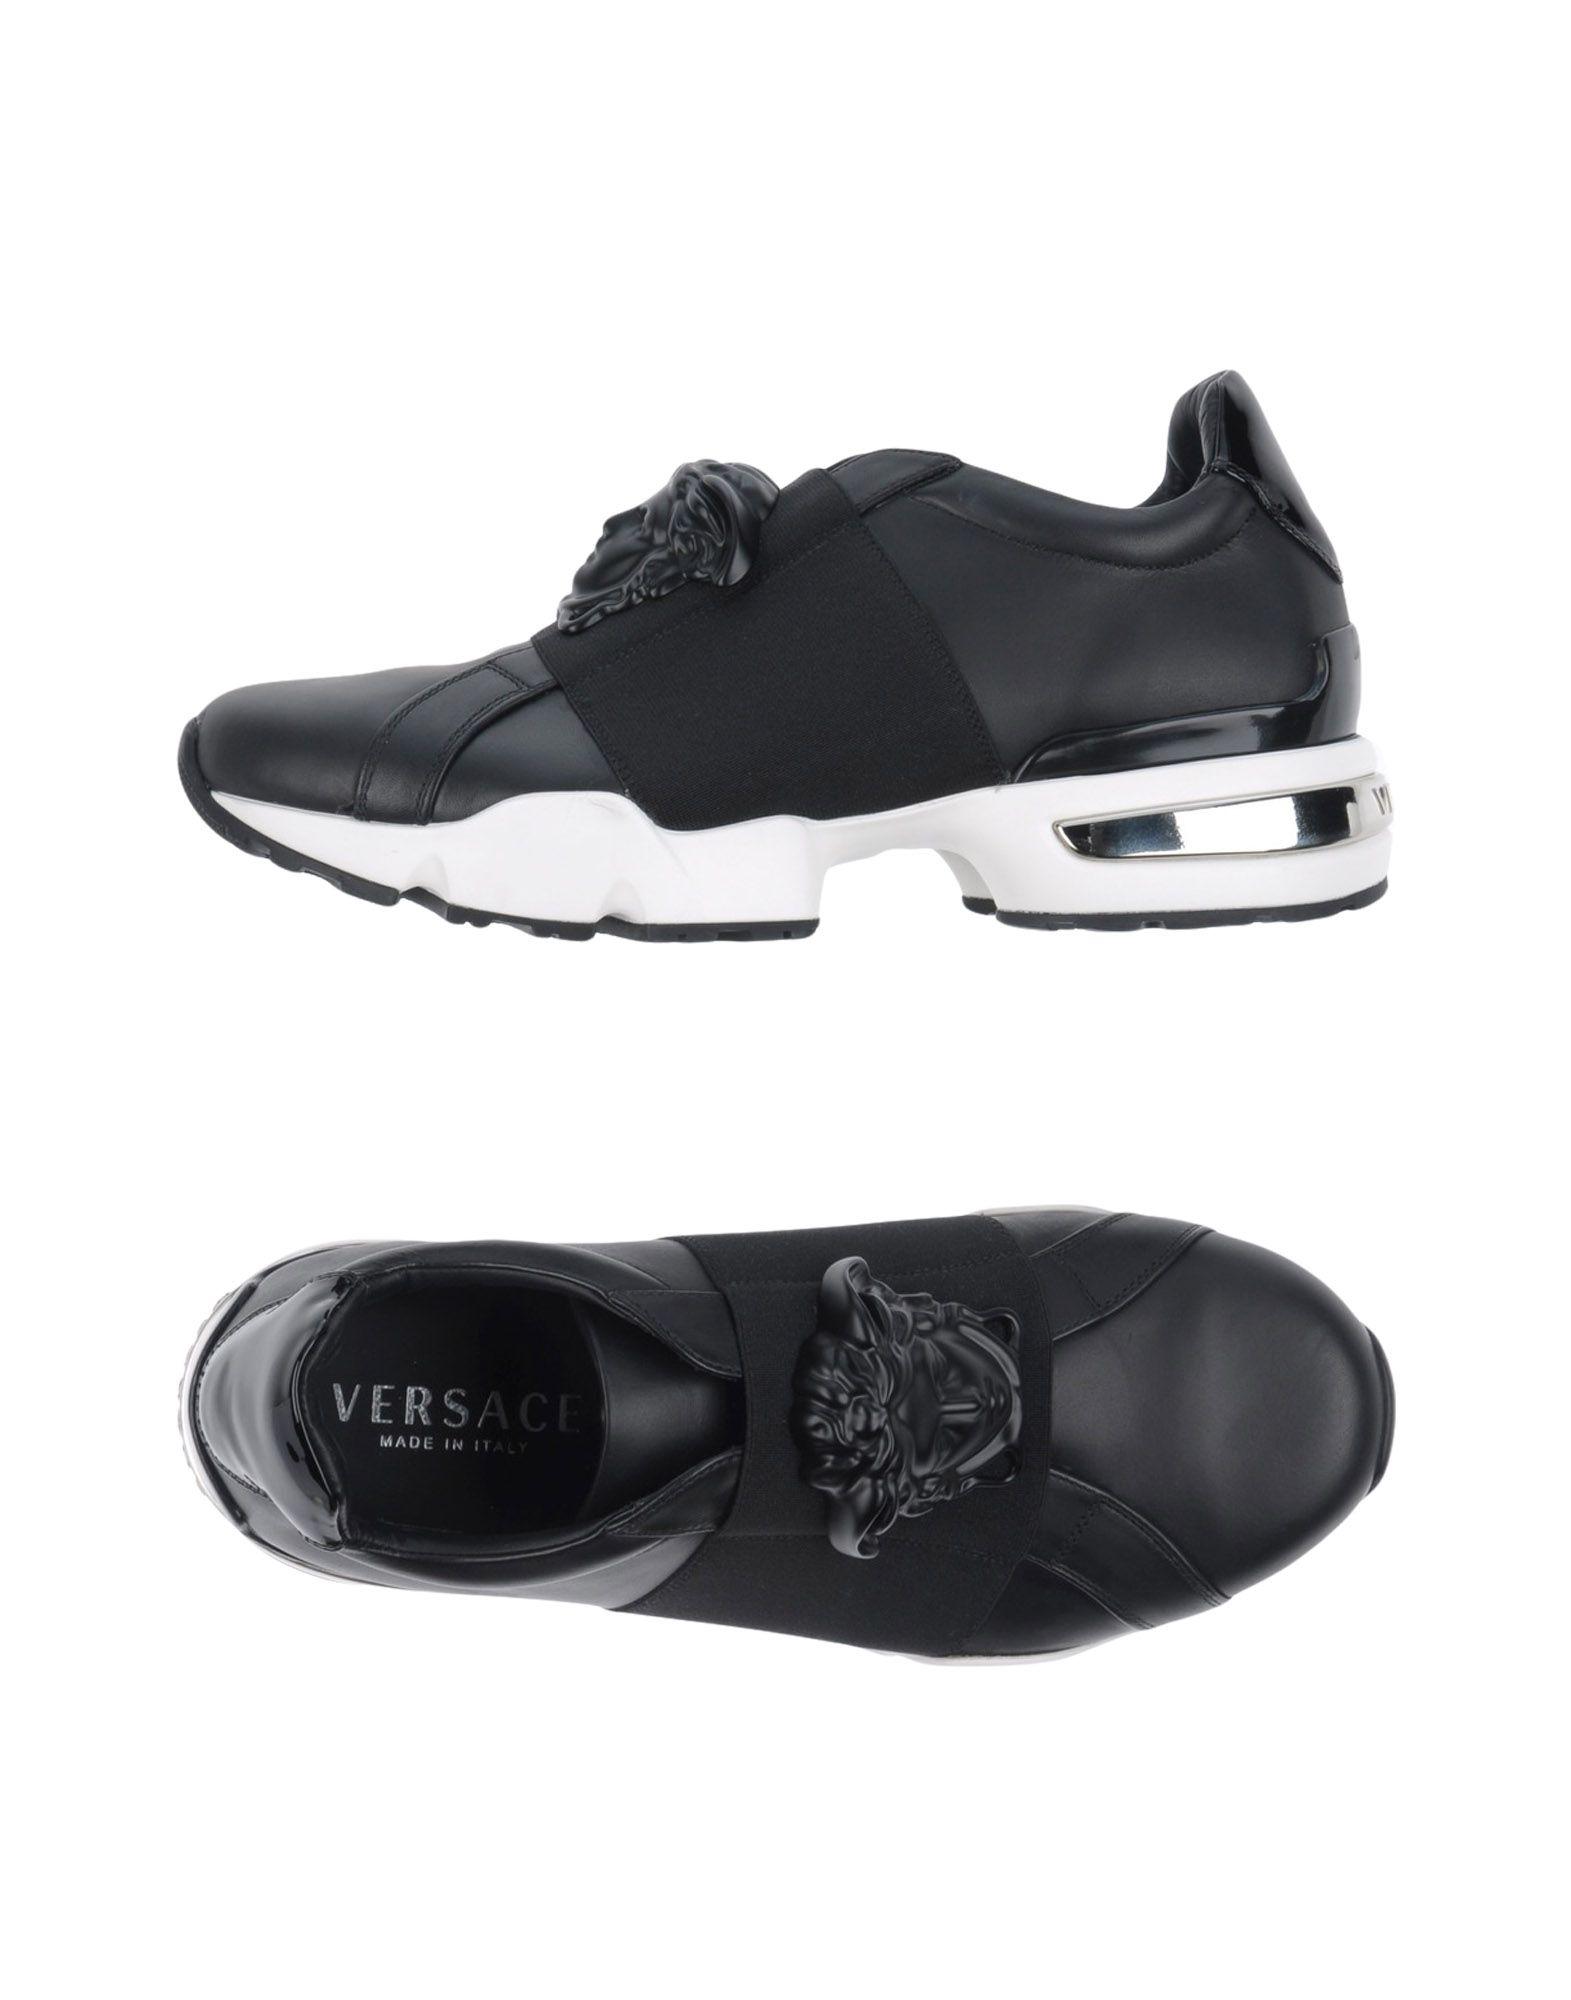 Sneakers homme versace